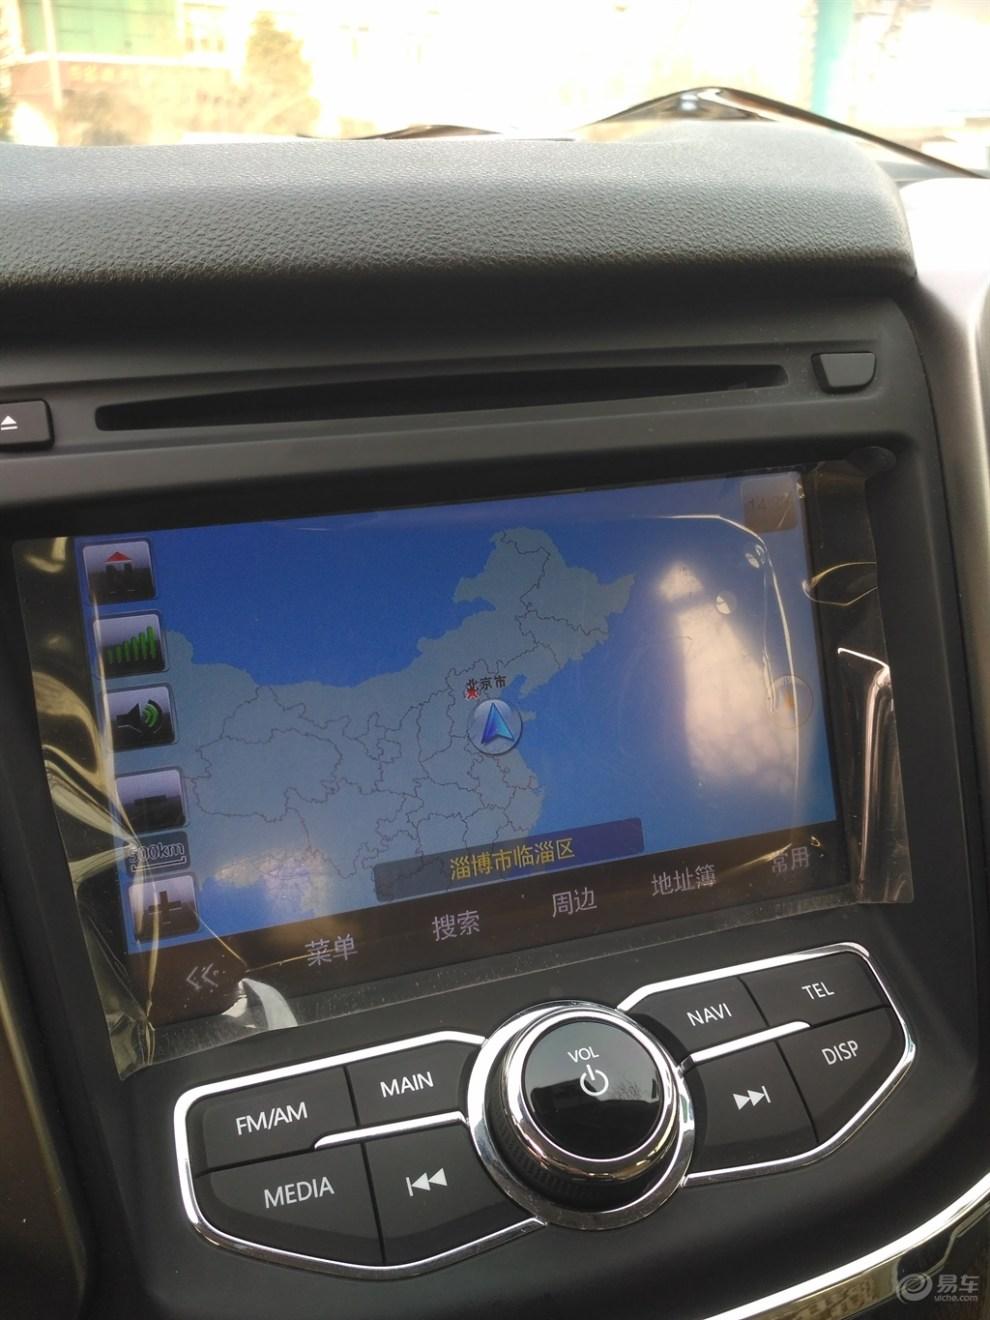 gmc保姆车 长安导航升级 cs75车载导航升级  最佳答案: 使用地图数据